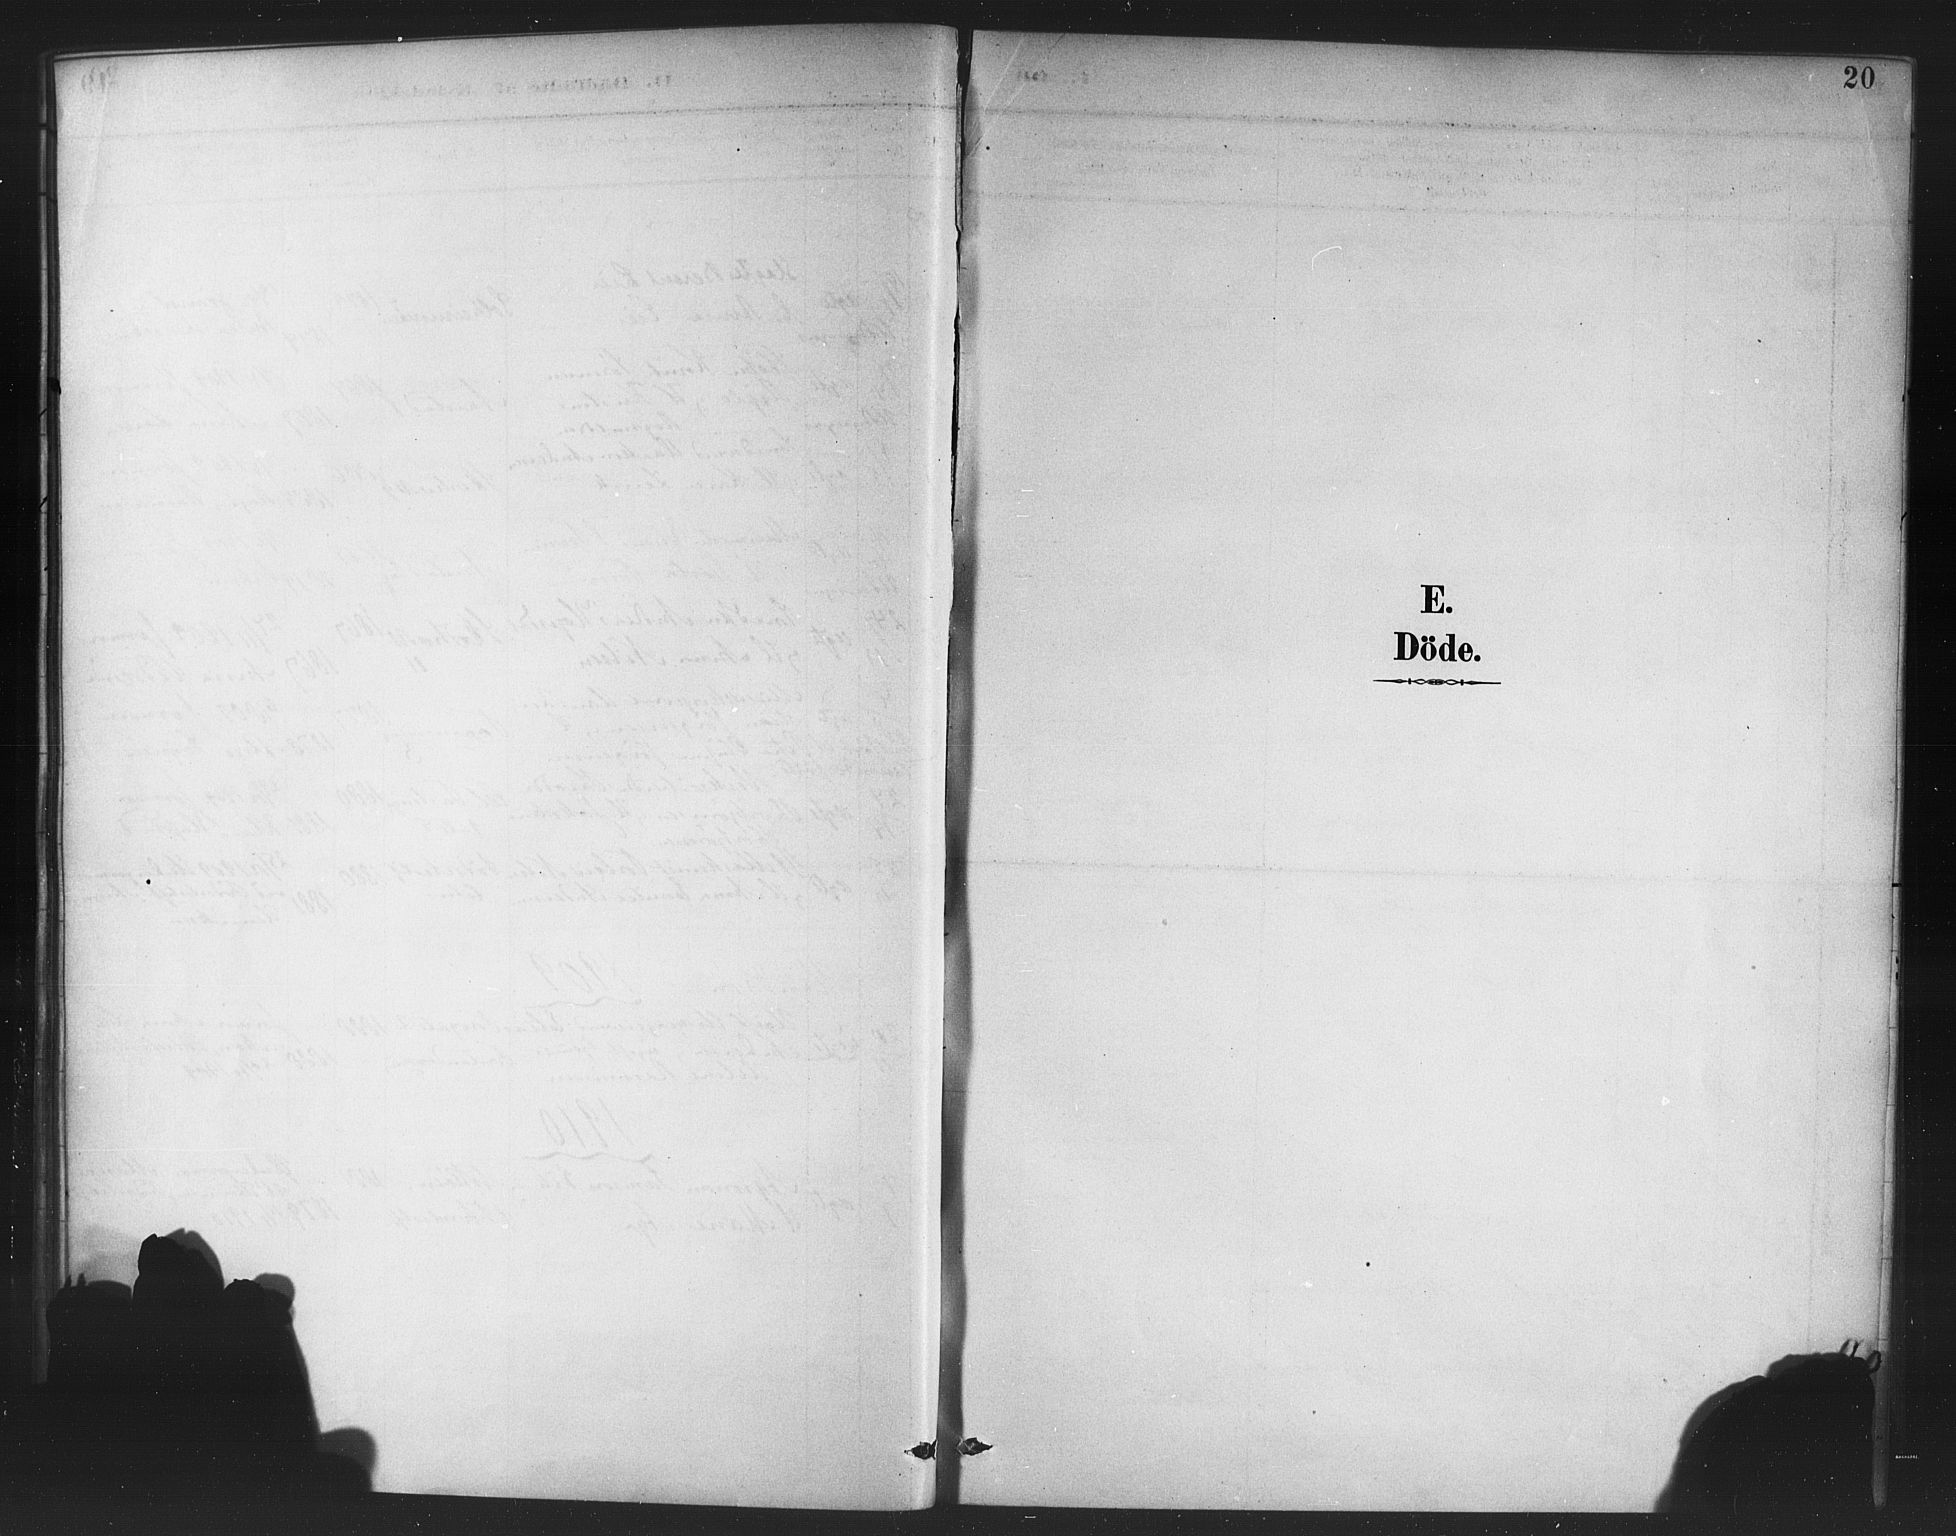 SAB, Korskirken Sokneprestembete, H/Haa/L0047: Ministerialbok nr. E 5, 1884-1910, s. 20